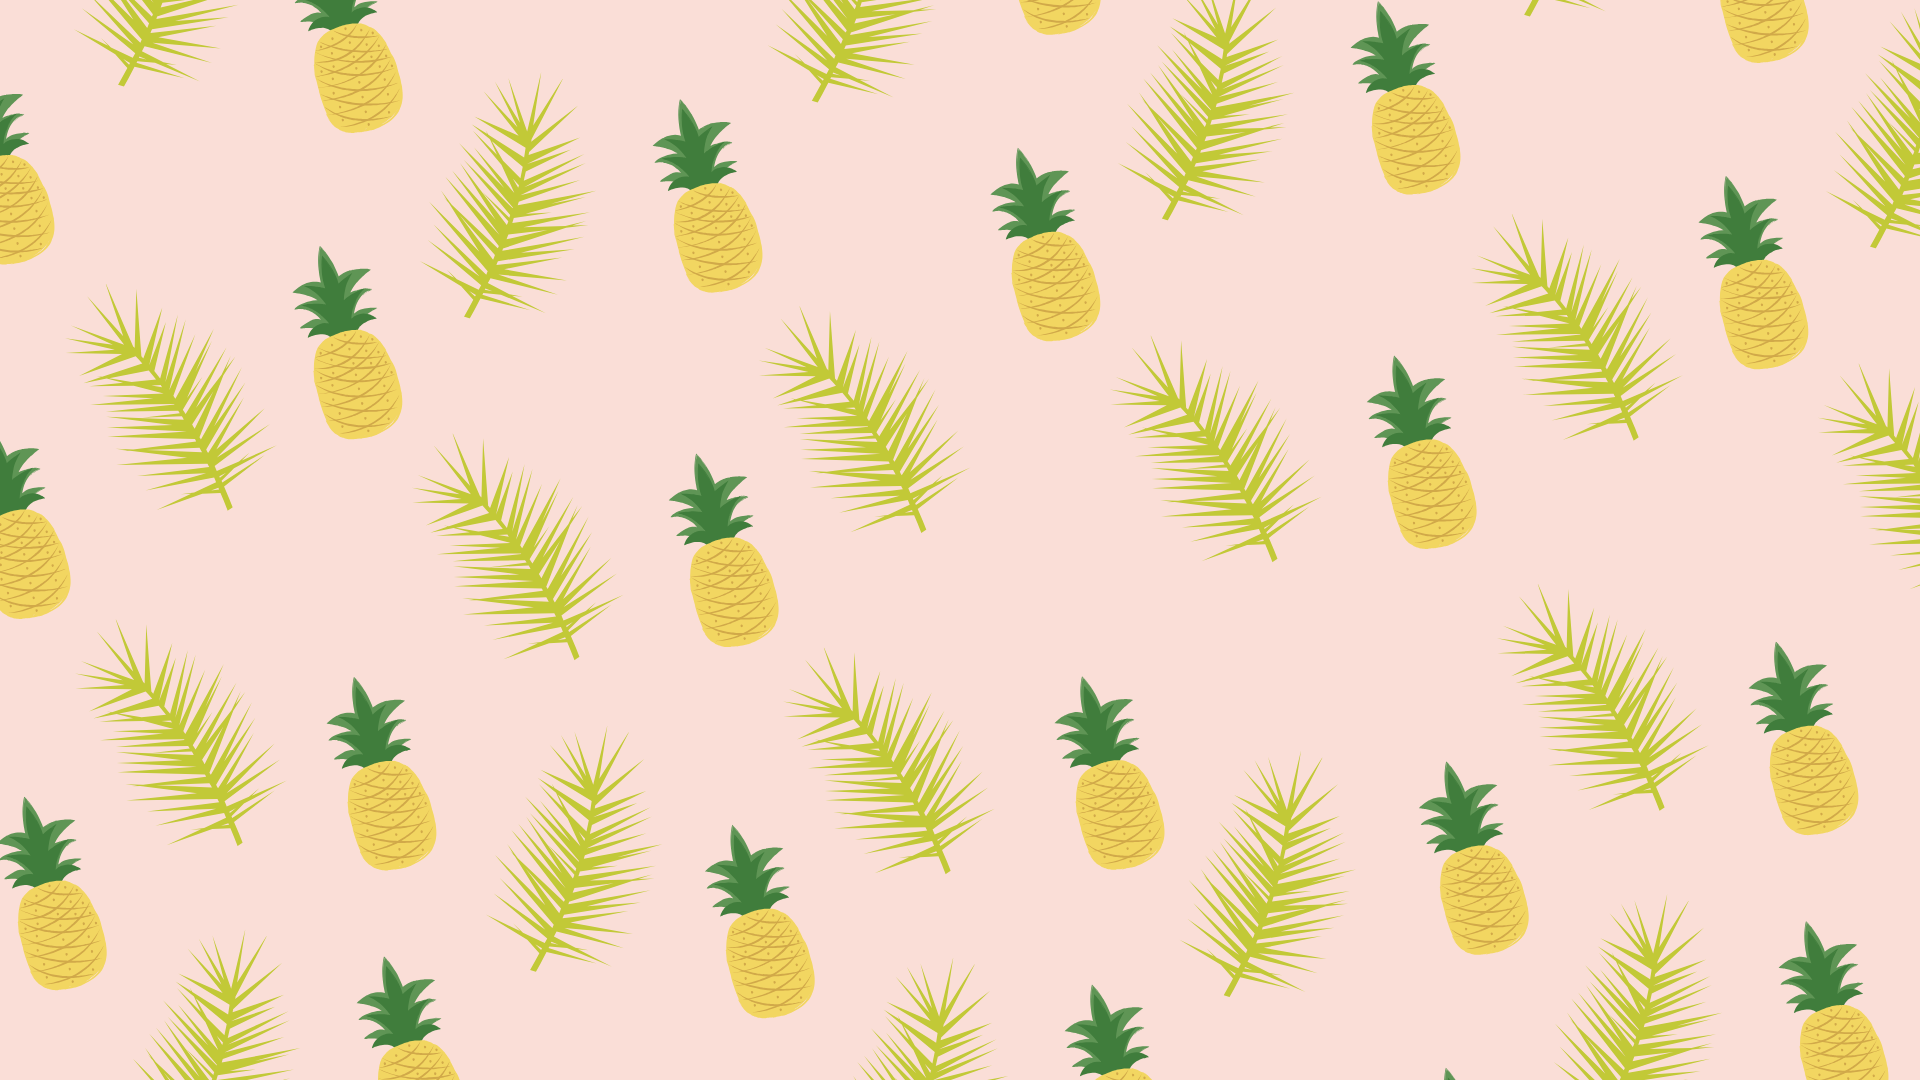 Pineapple Leaf Pattern Pastel Dreams Free Macbook Laptop And Desktop Wallpaper Background S Desktop Wallpapers Backgrounds Pineapple Wallpaper Iphone Instagram